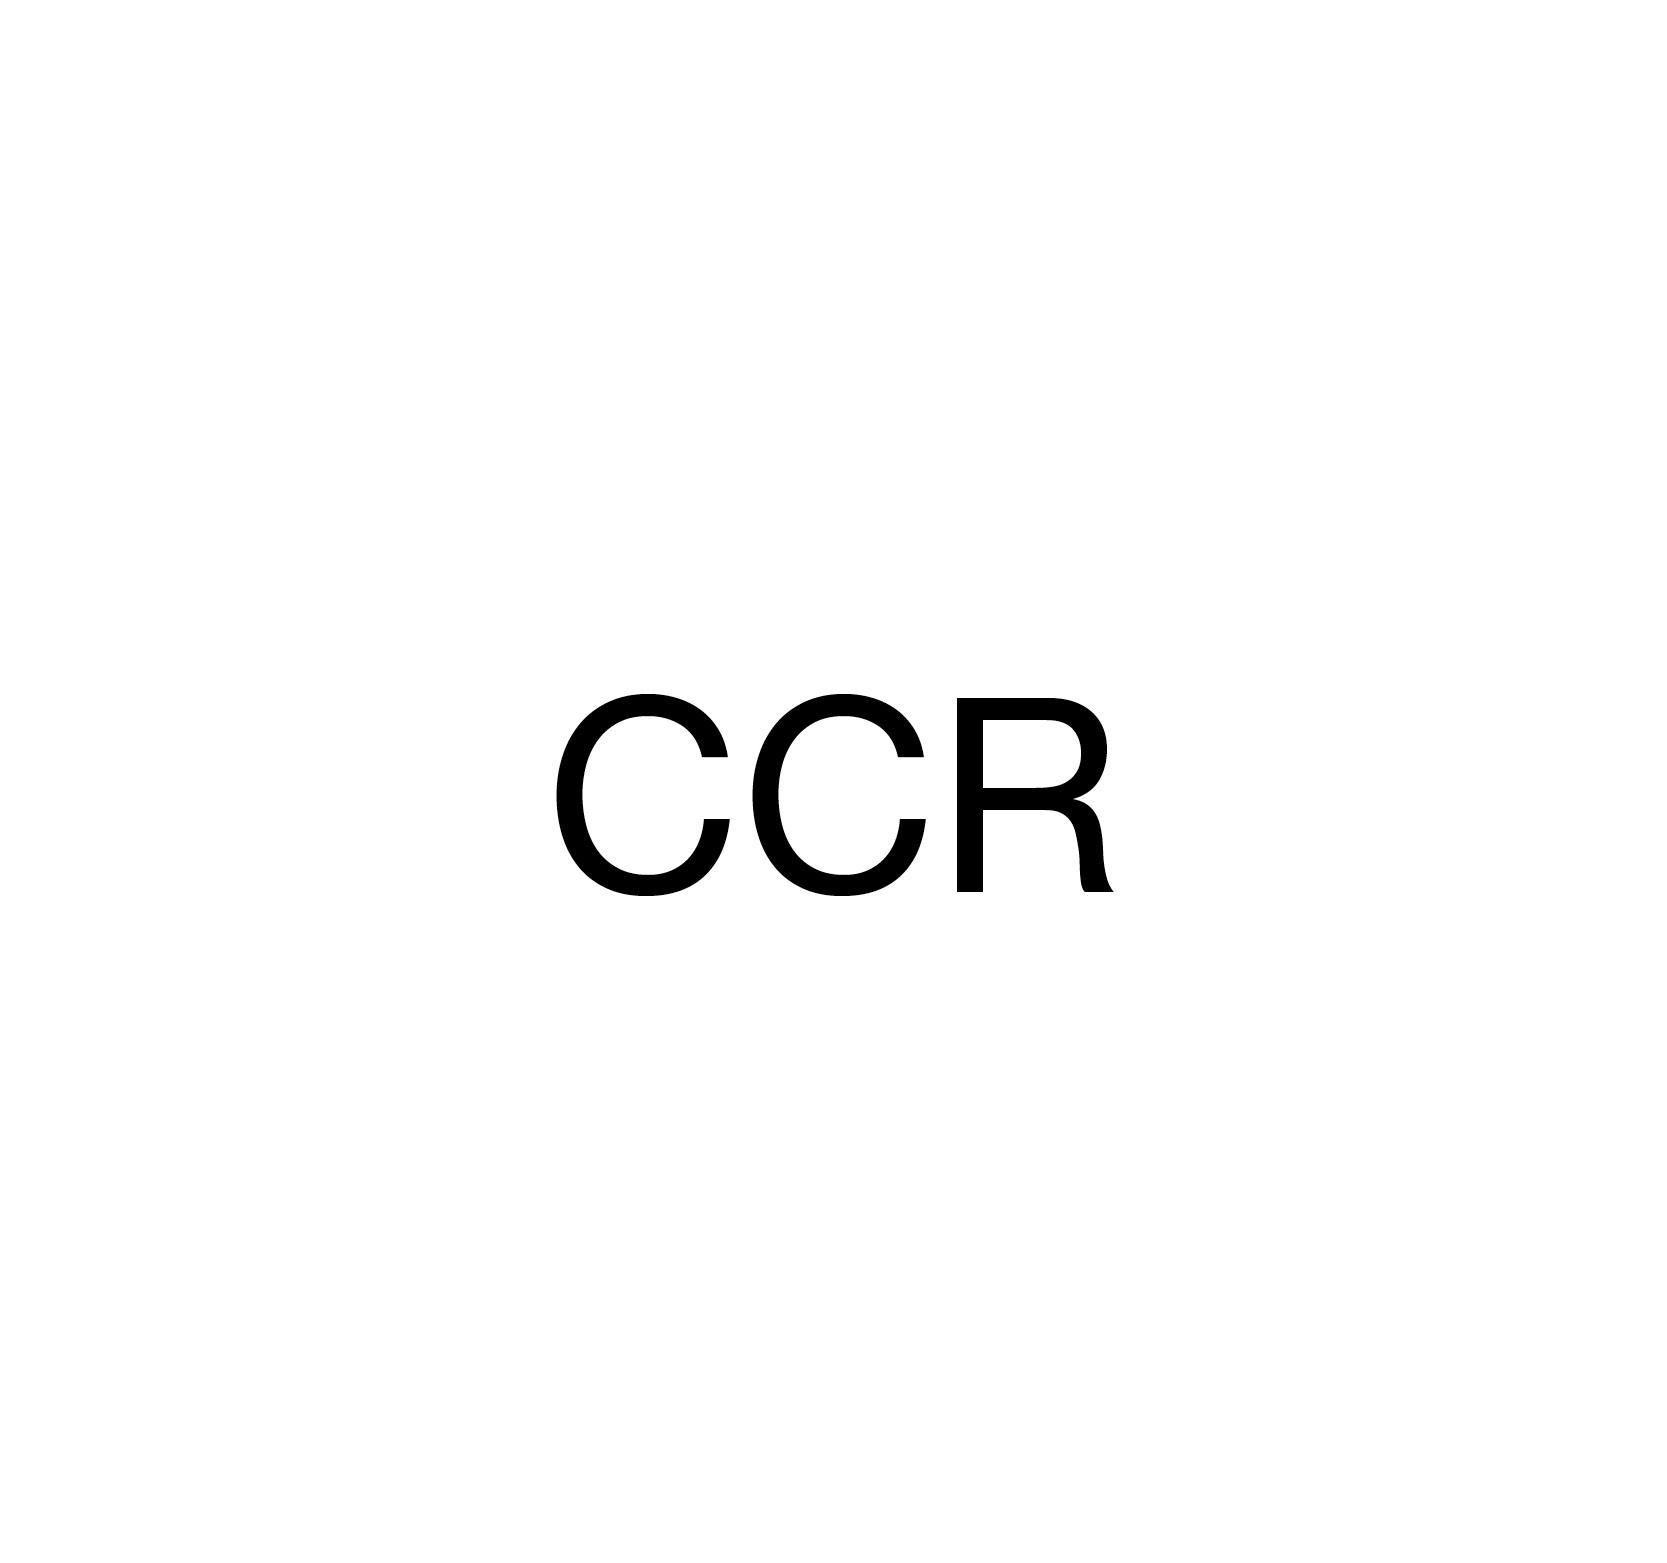 CCR.jpg